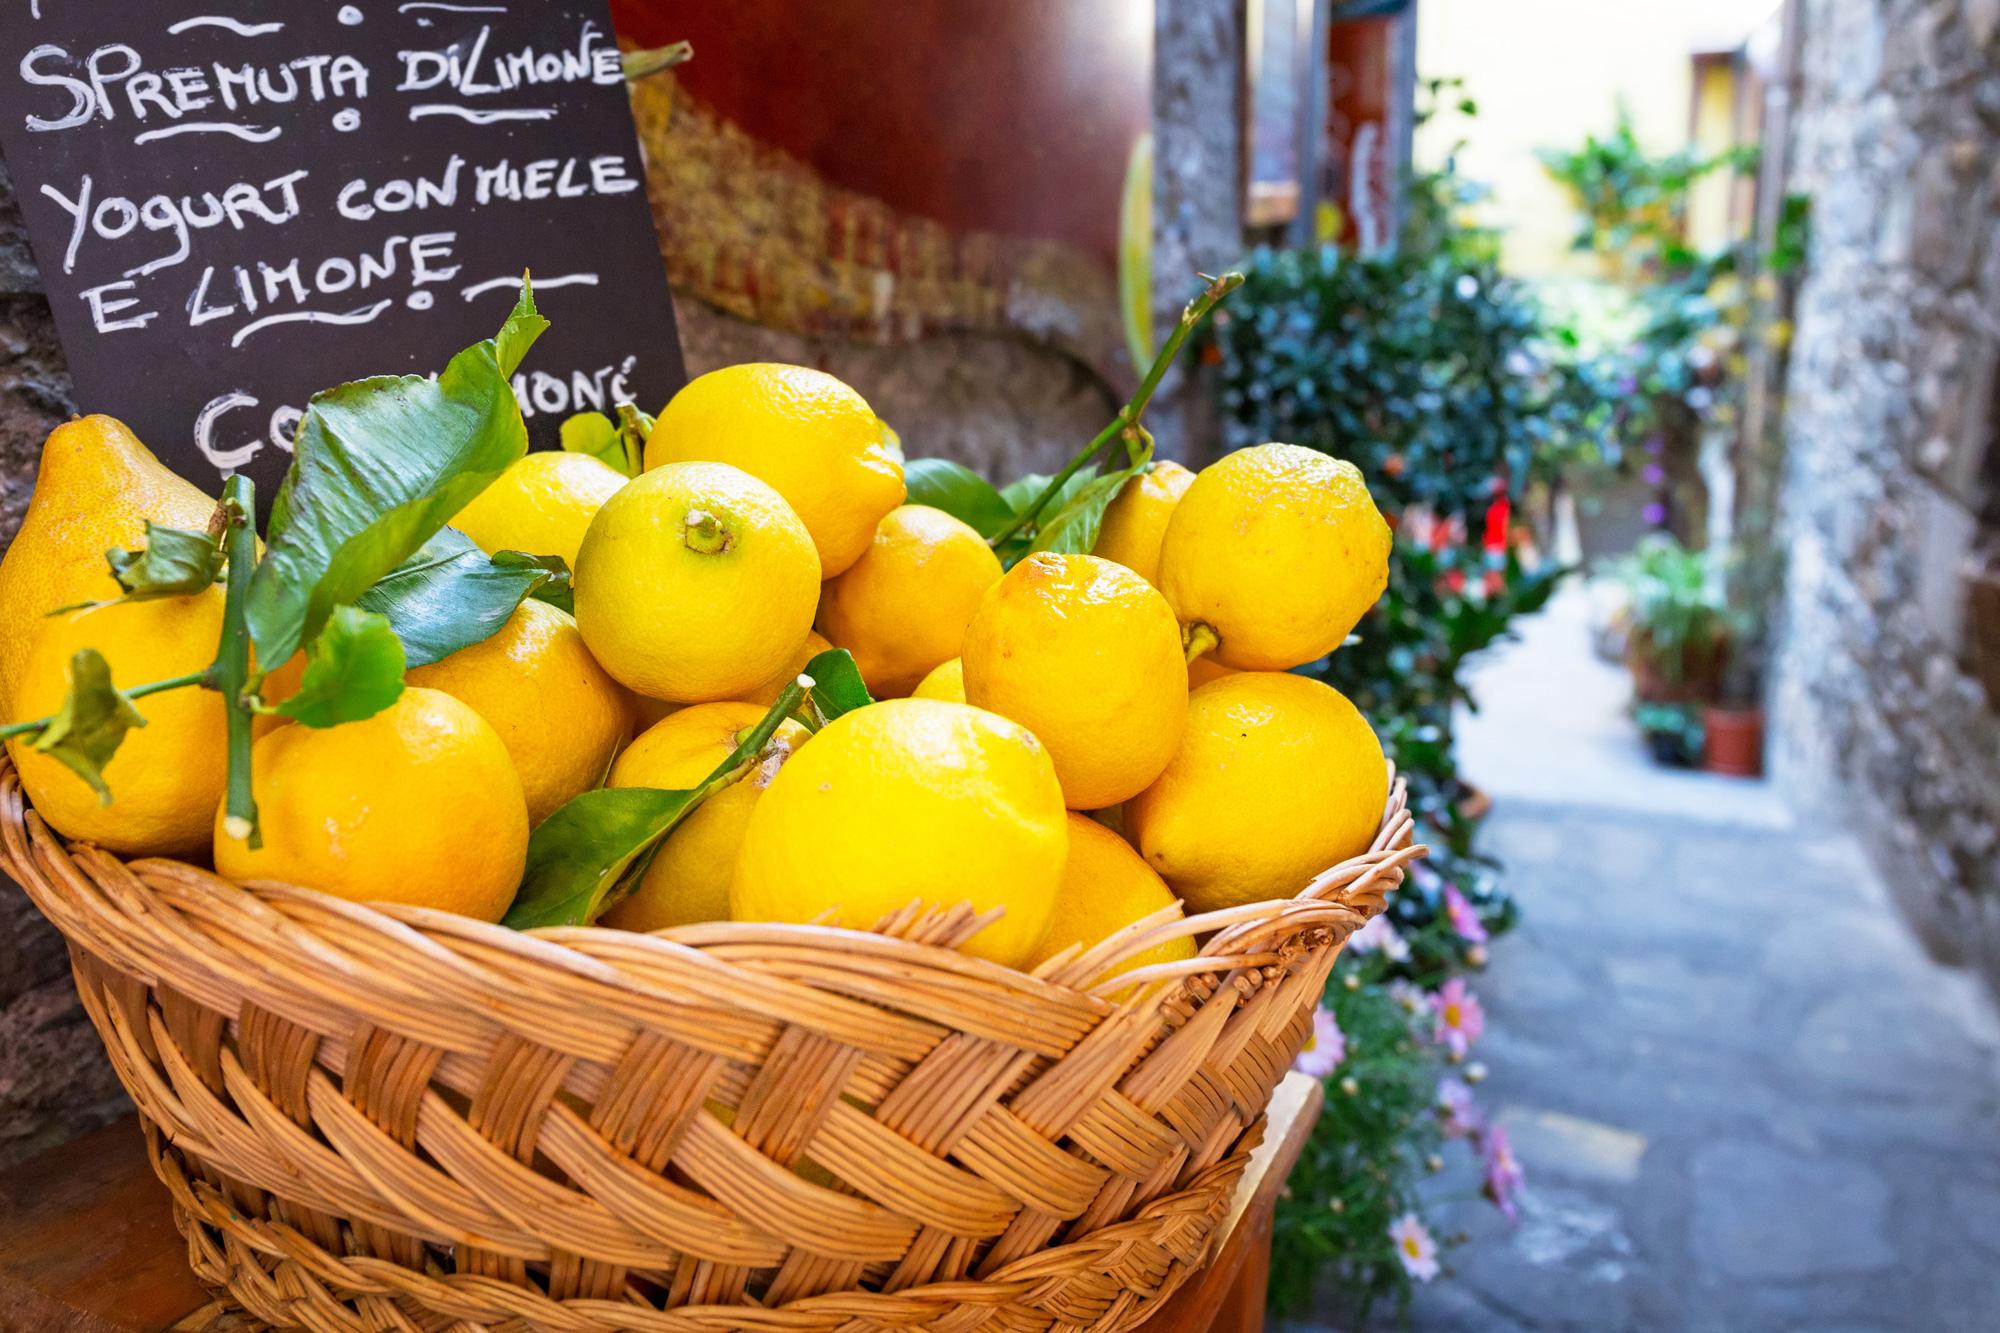 italy basket of lemons in street istk